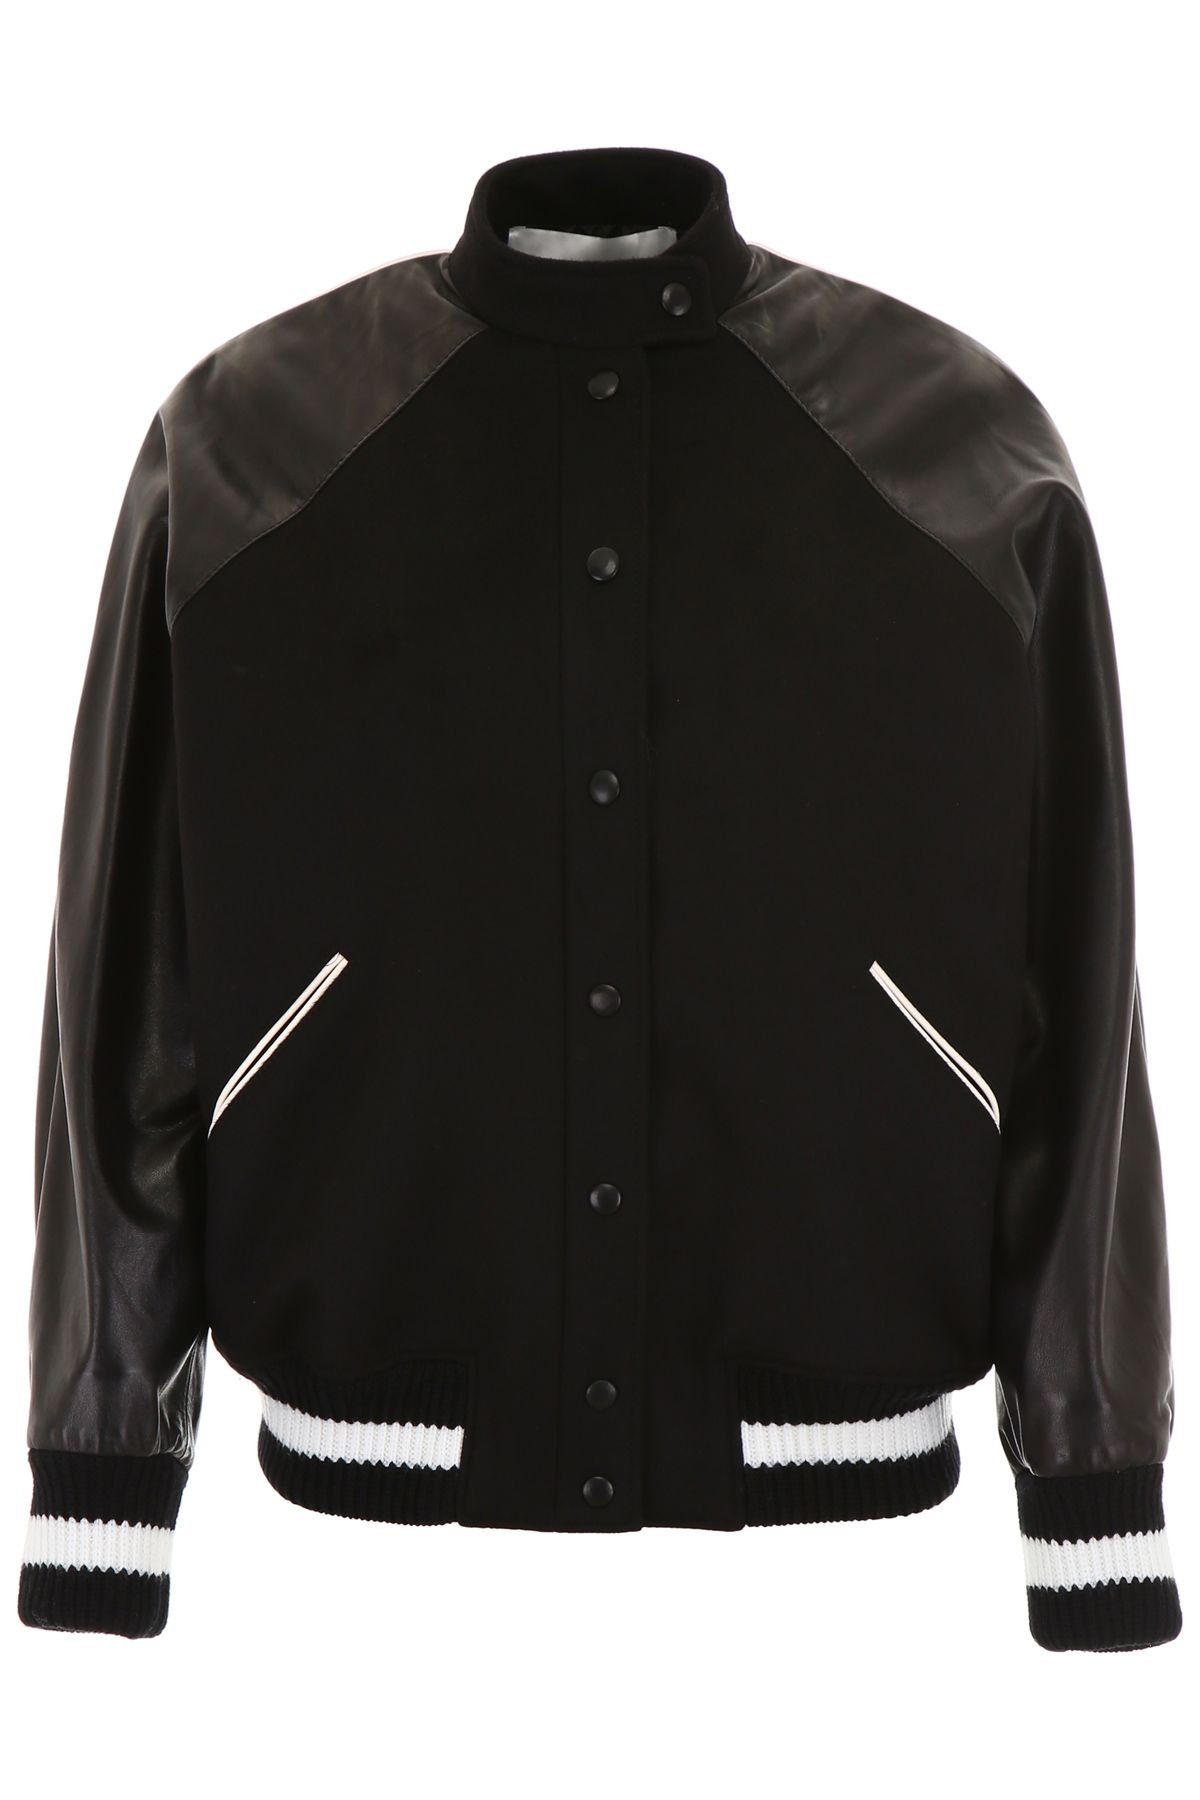 Valentino Jacket Bomber Nero nero Vltn FrqFTxS